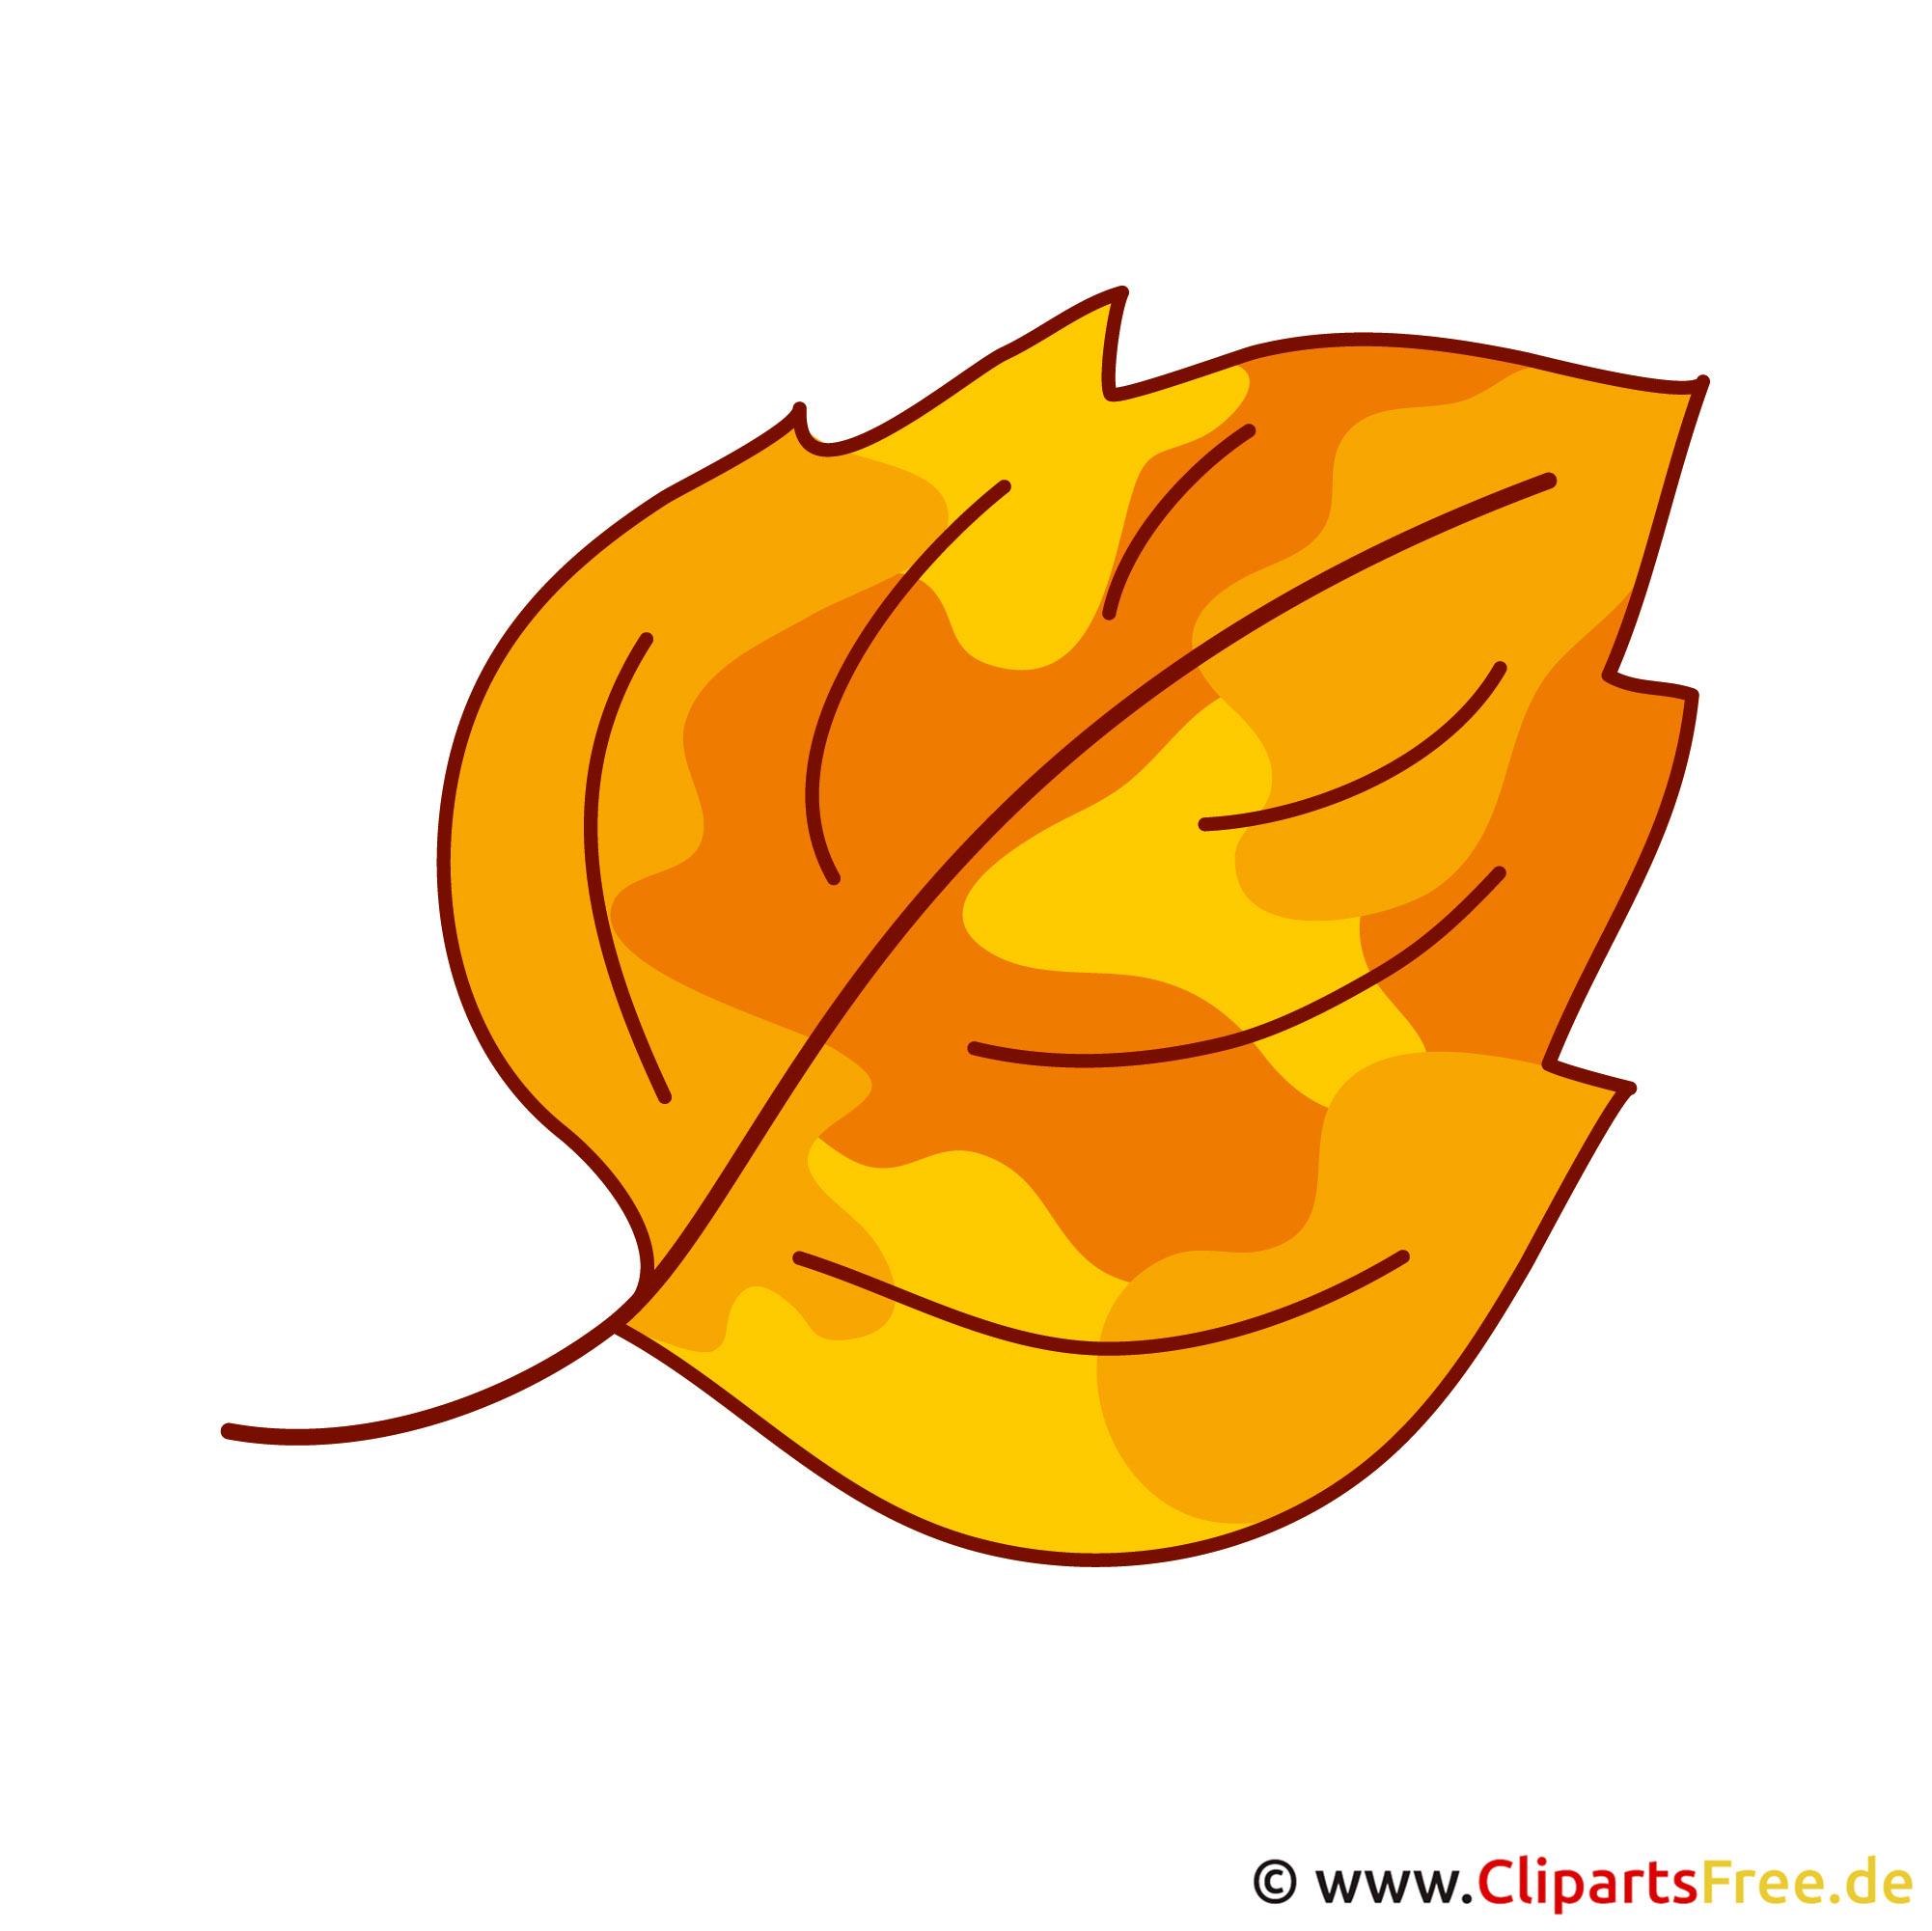 Blatt Clipart - Herbst Bilder gratis